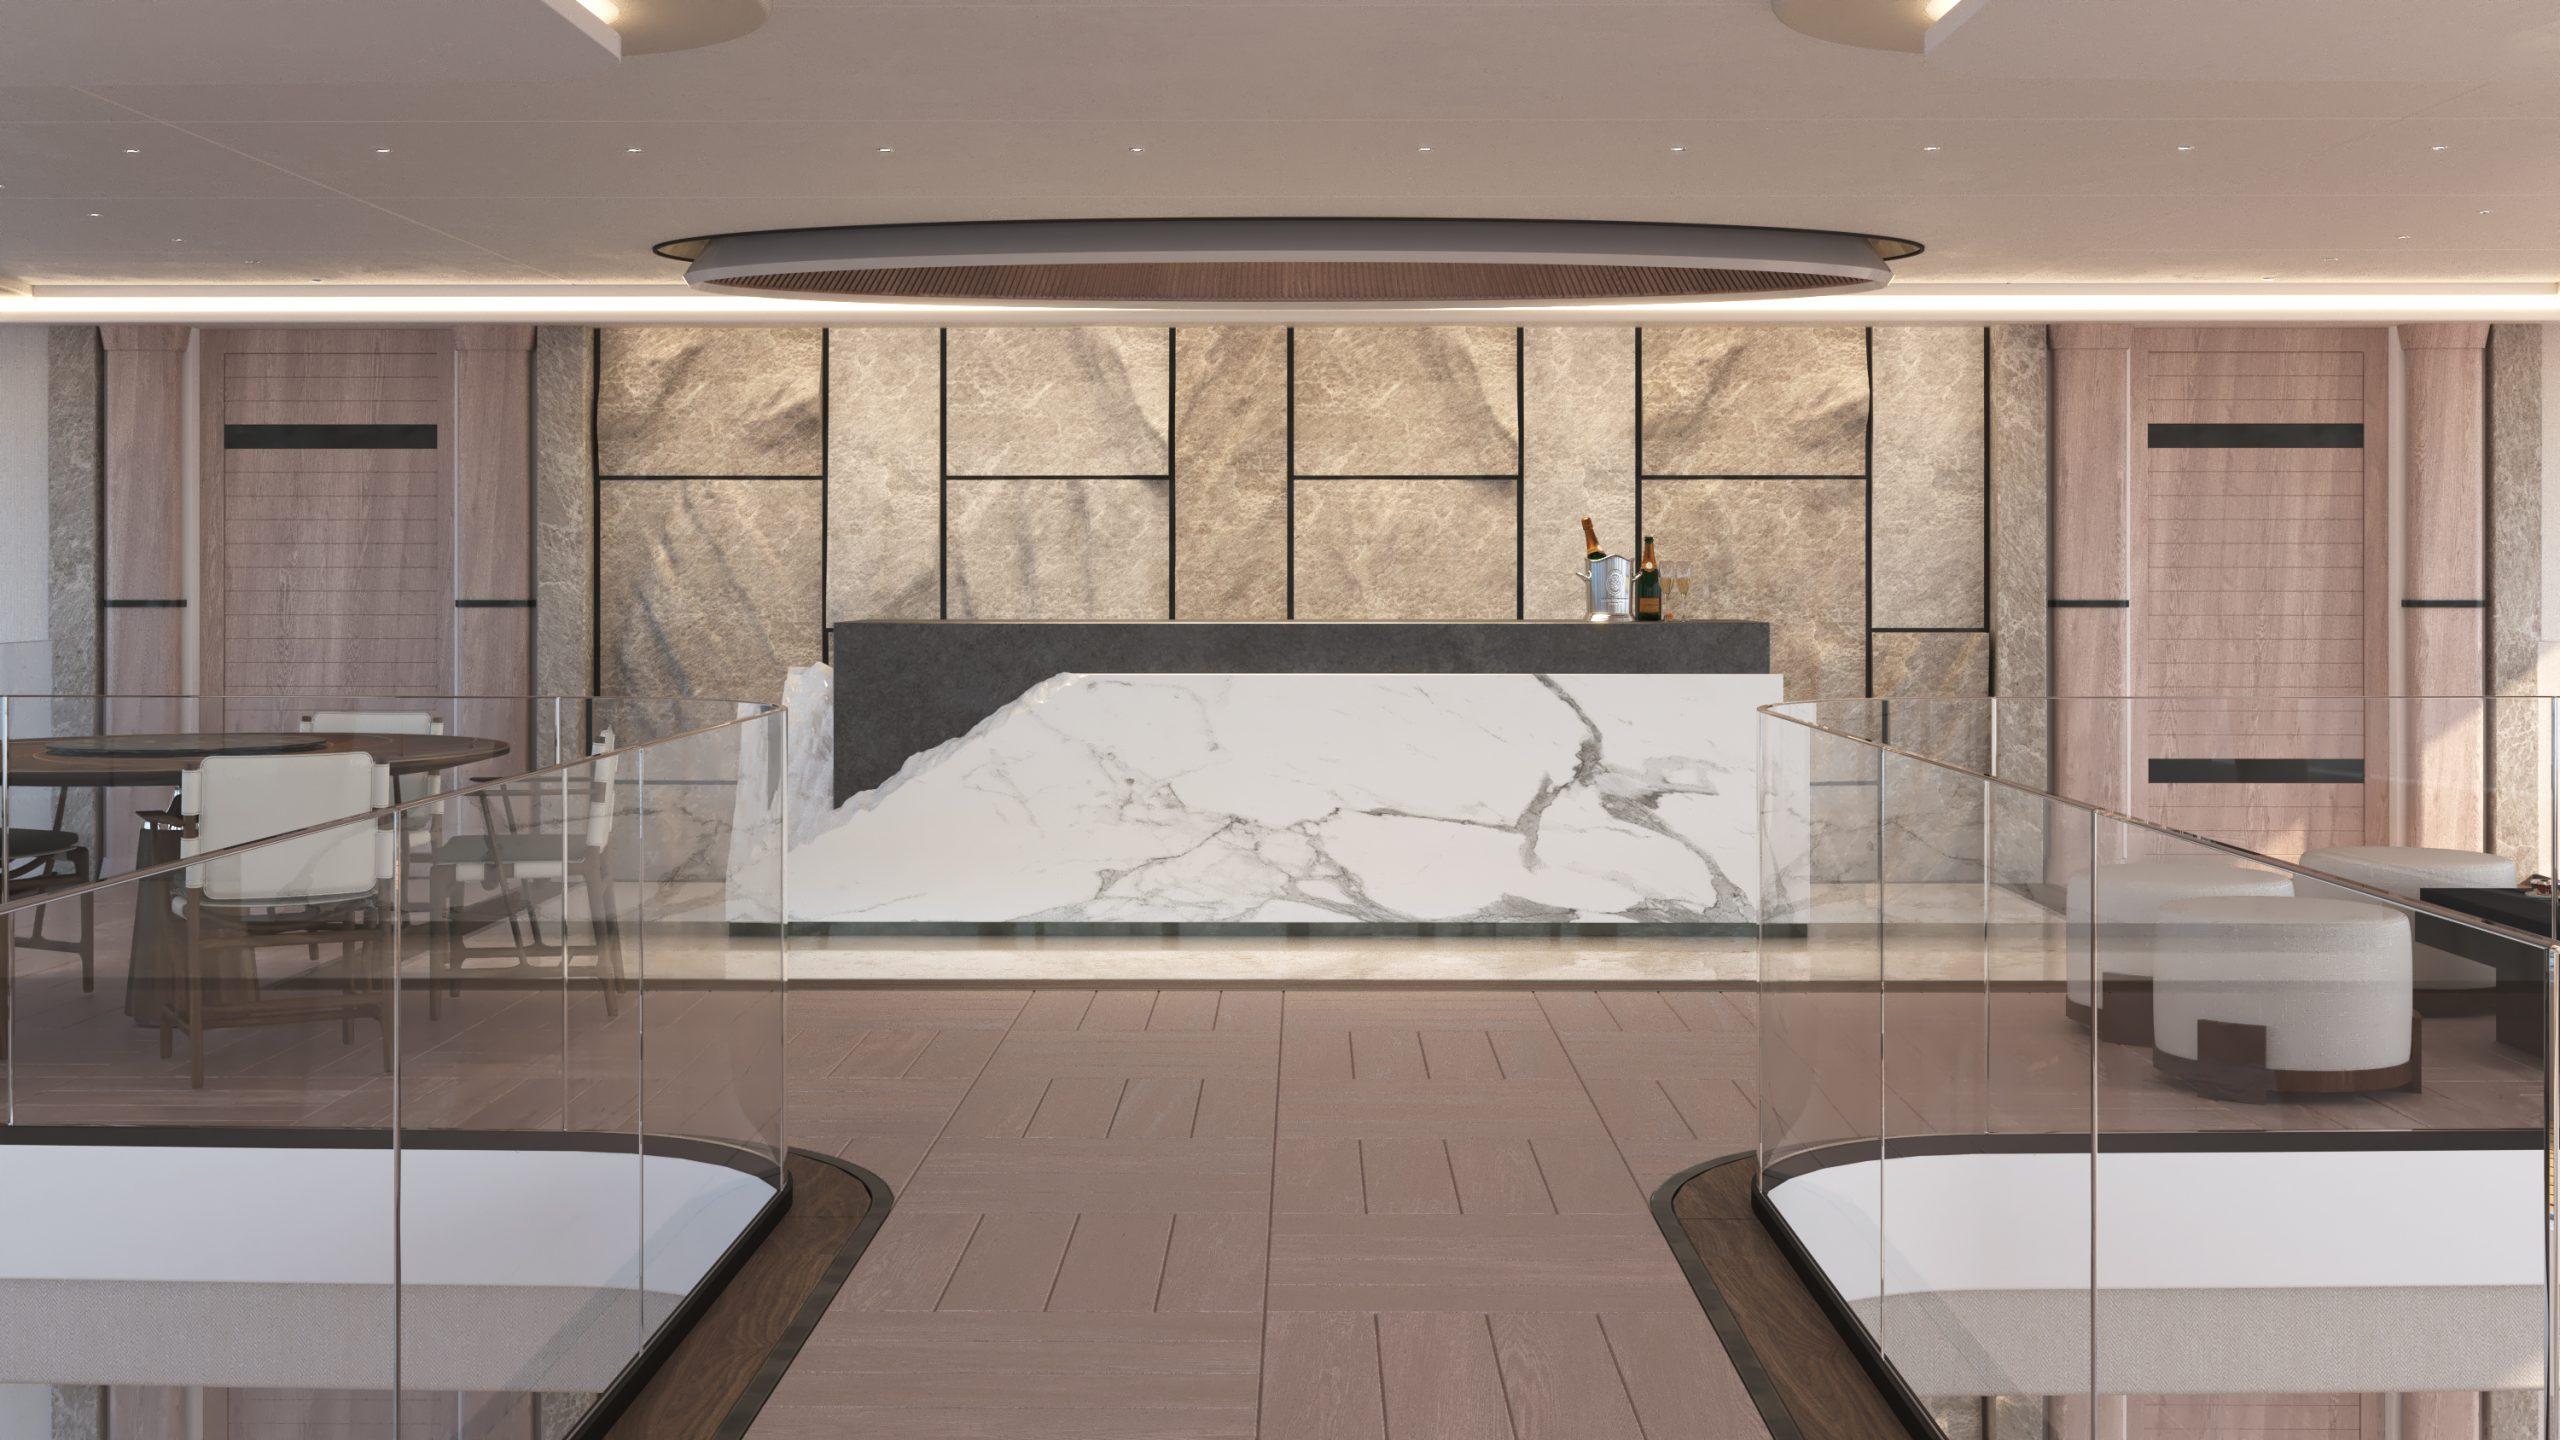 Piredda & Partners Interior